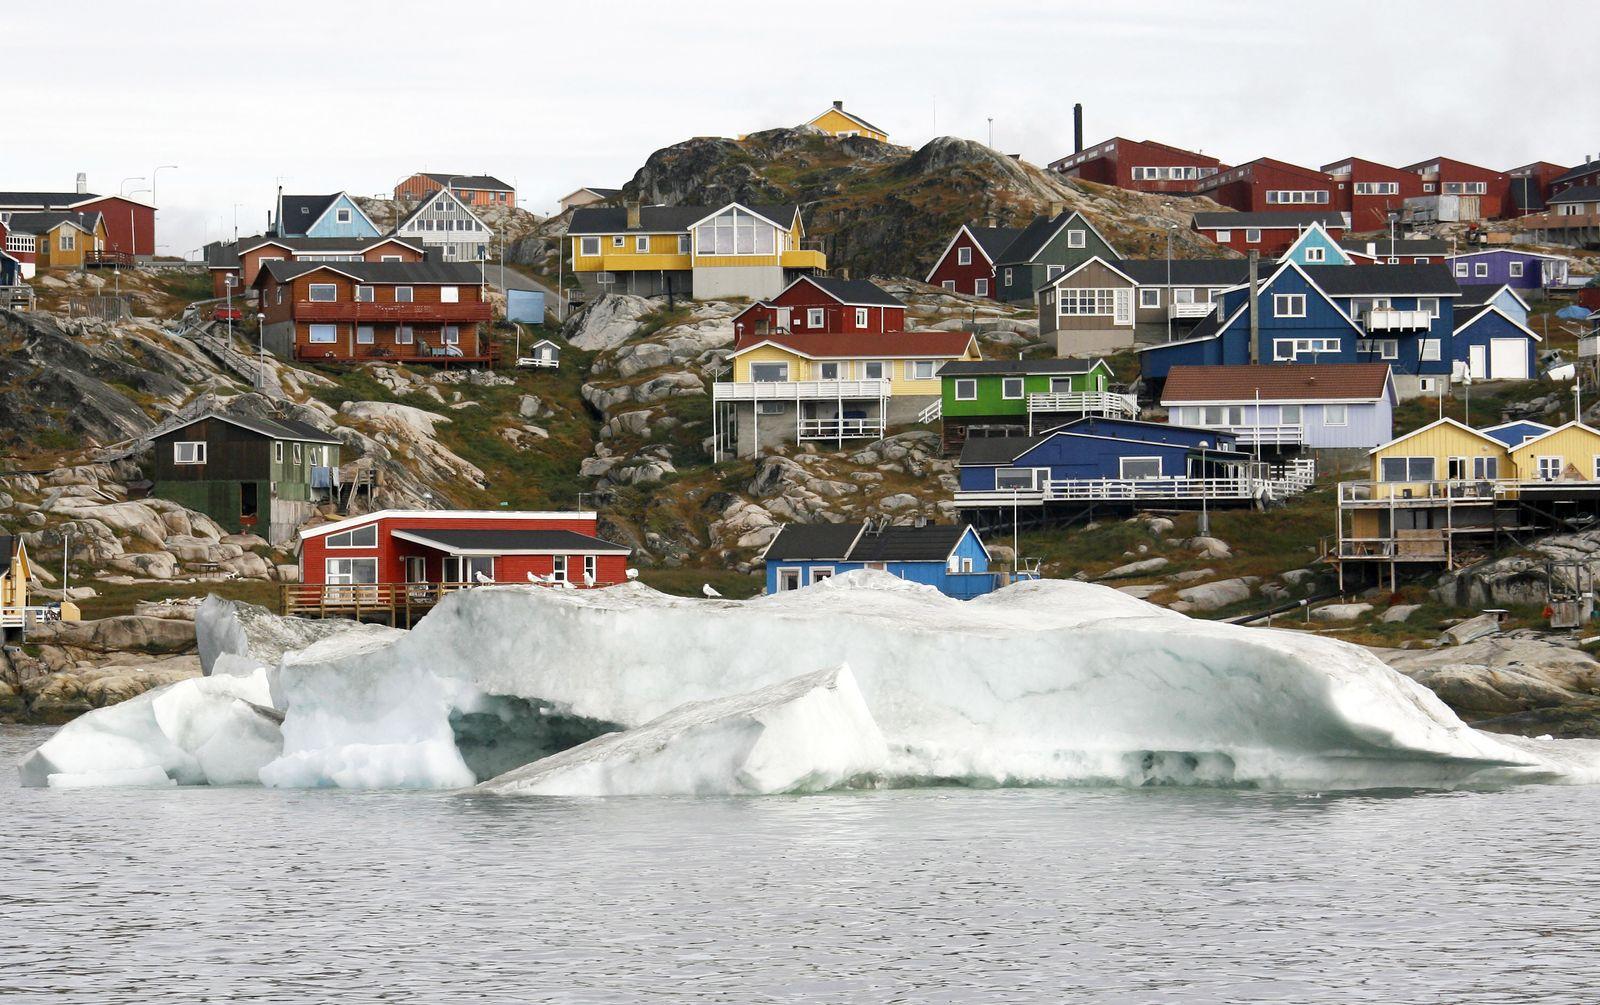 Grönland / Ilulissat